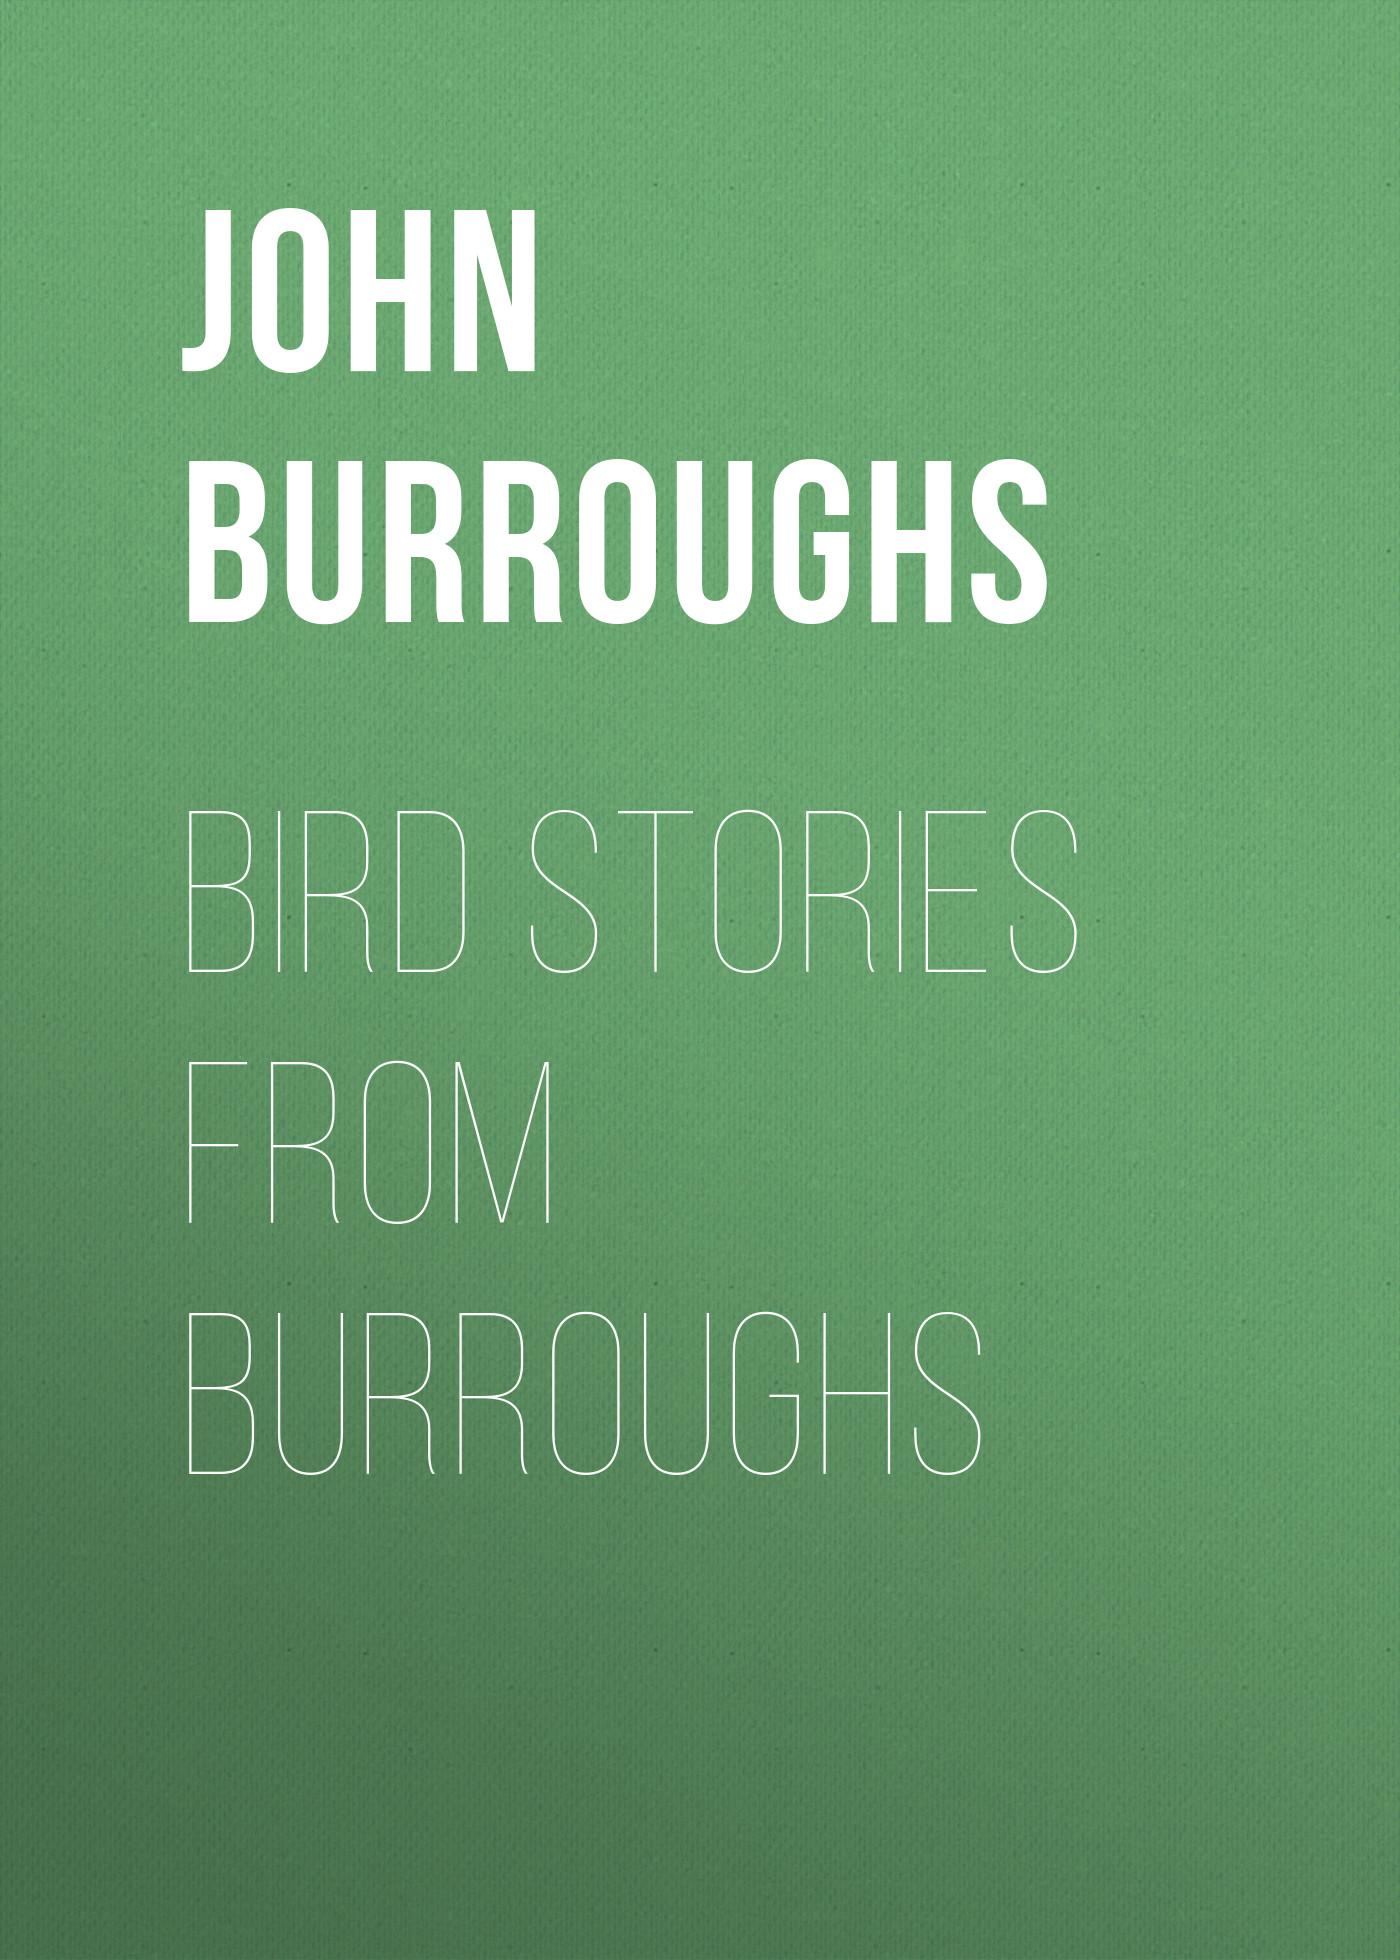 John Burroughs Bird Stories from Burroughs john bird basic engineering mathematics